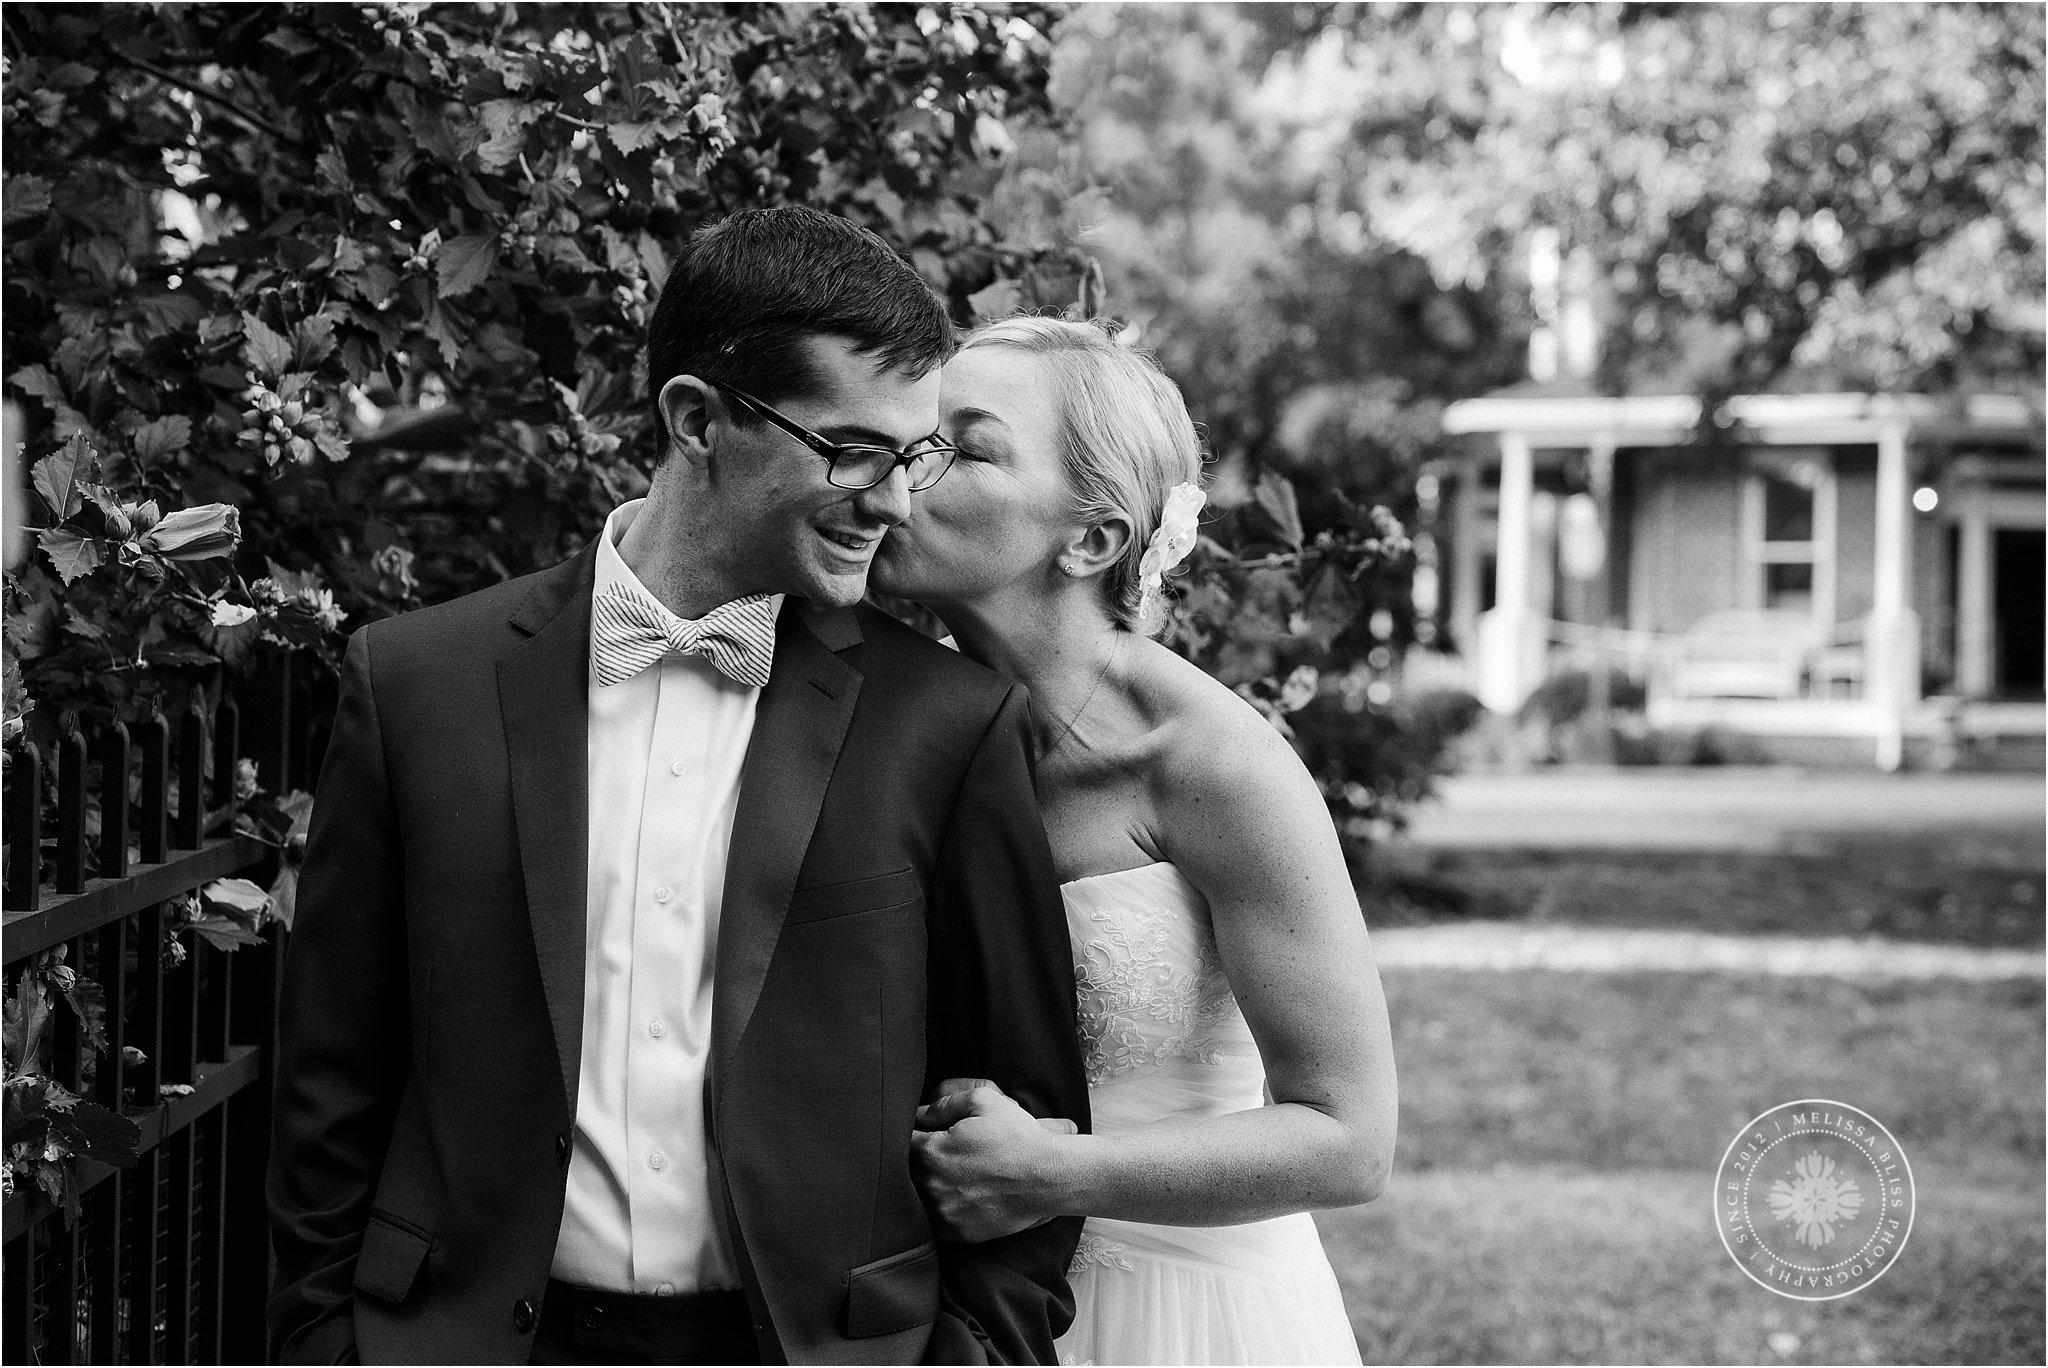 beautiful-wedding-images-by-melissa-bliss-photography-norfolk-virginia-beach-premiere-wedding-photographers-sandbridge-chesapeake-va-beach-wedding-photography